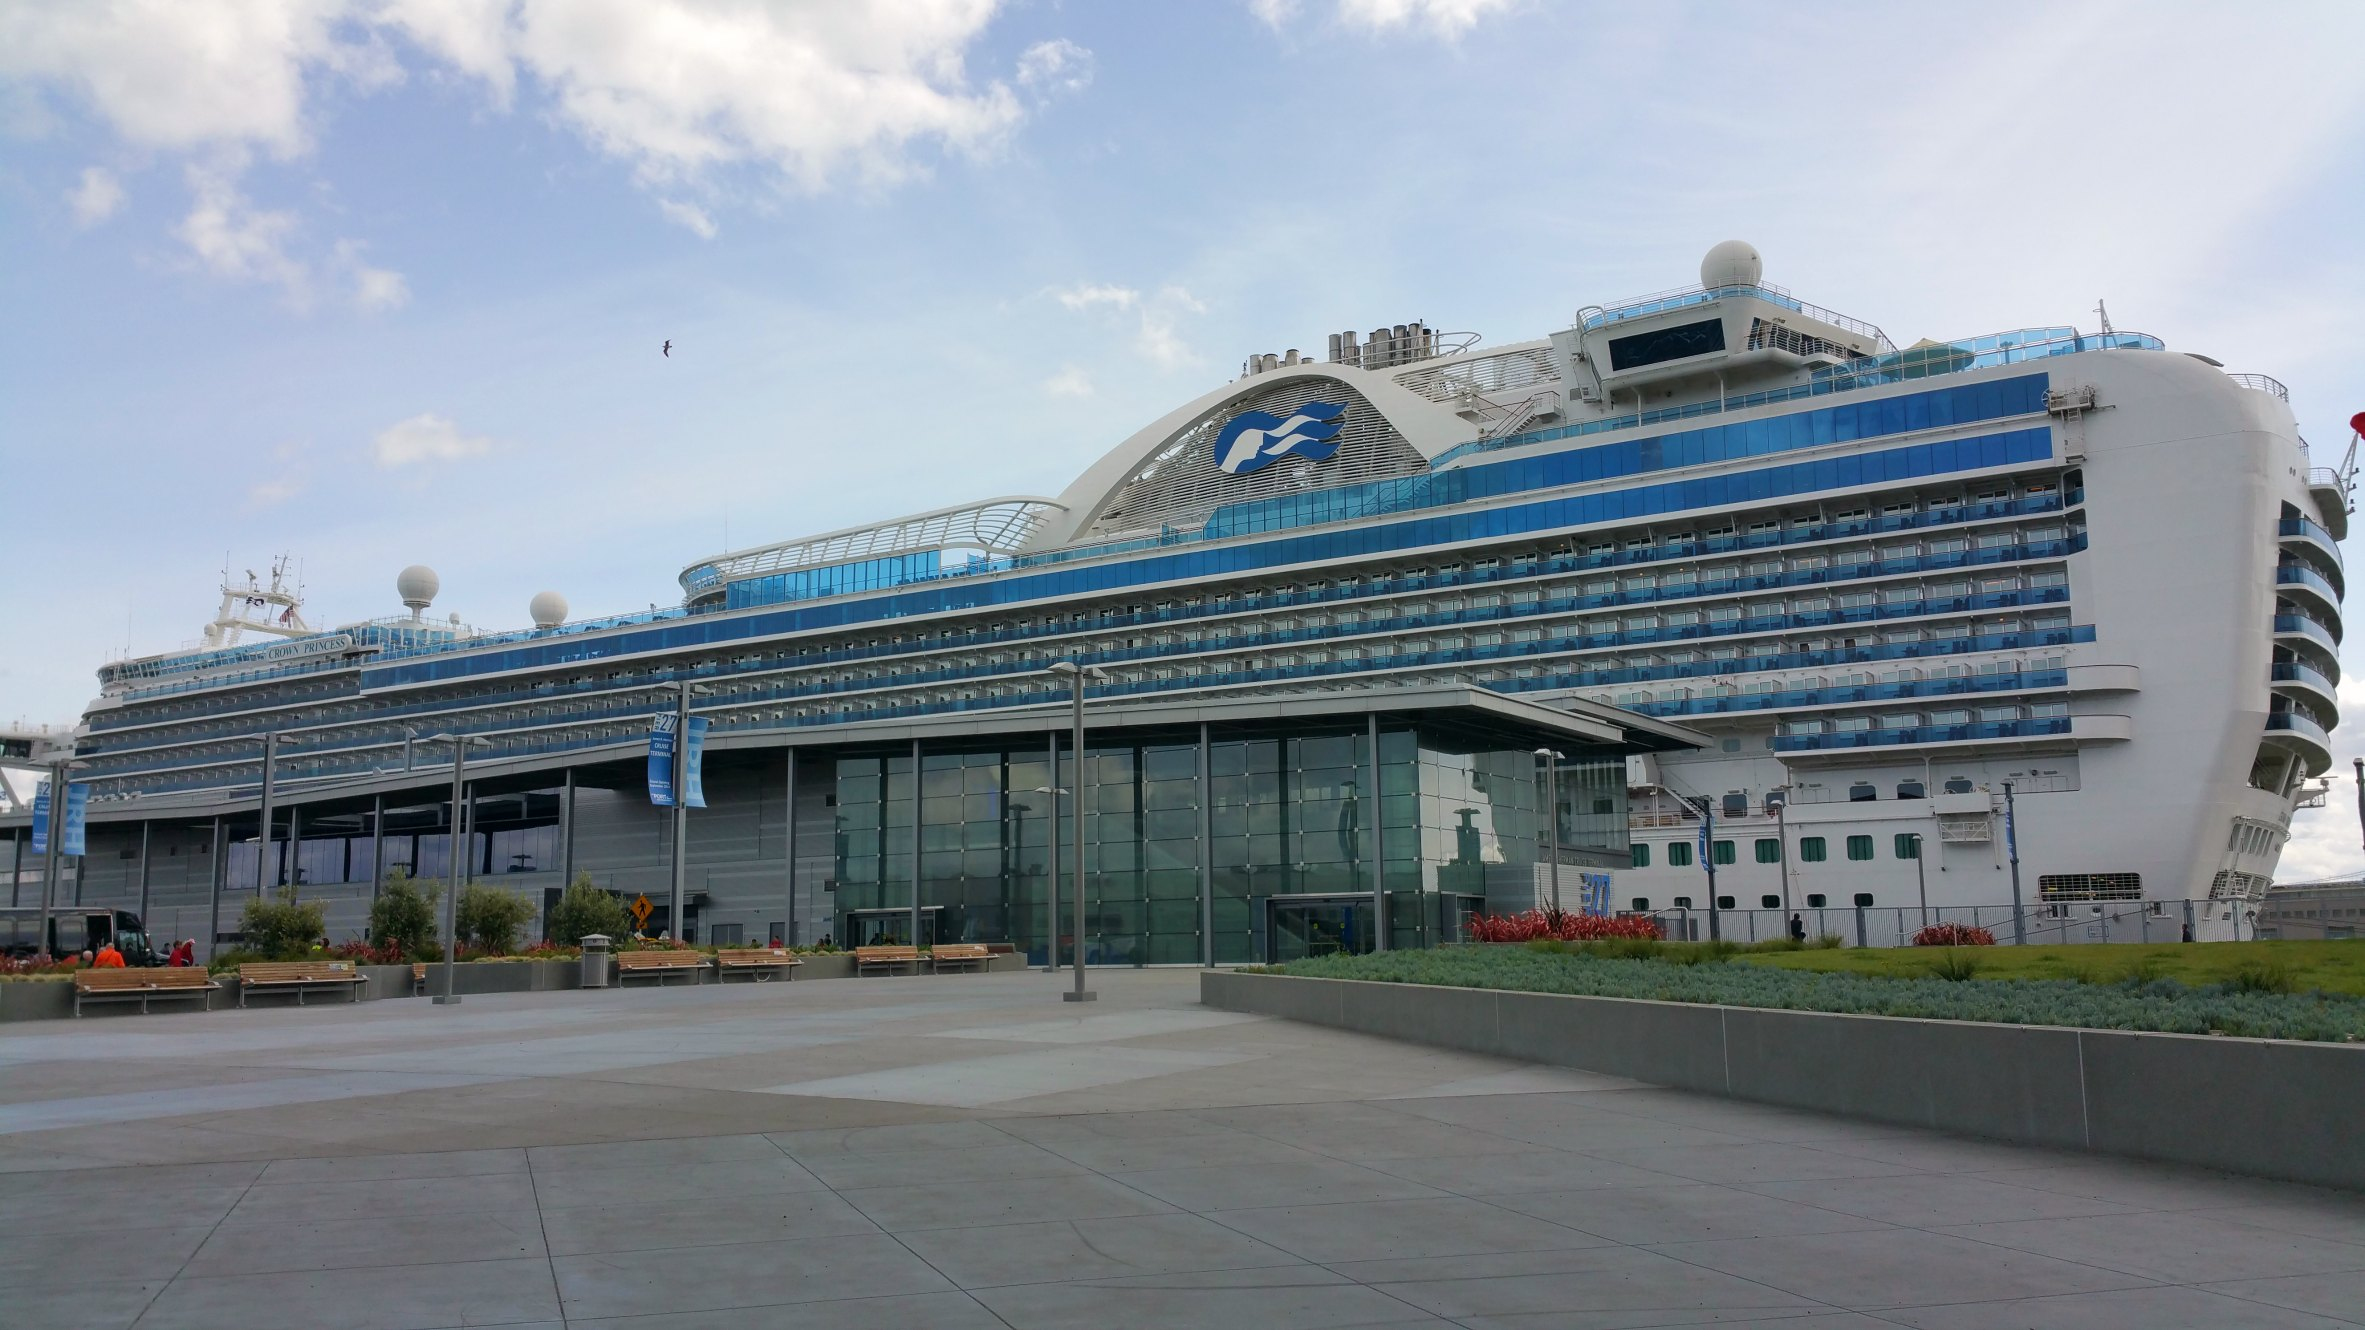 docked crown princess